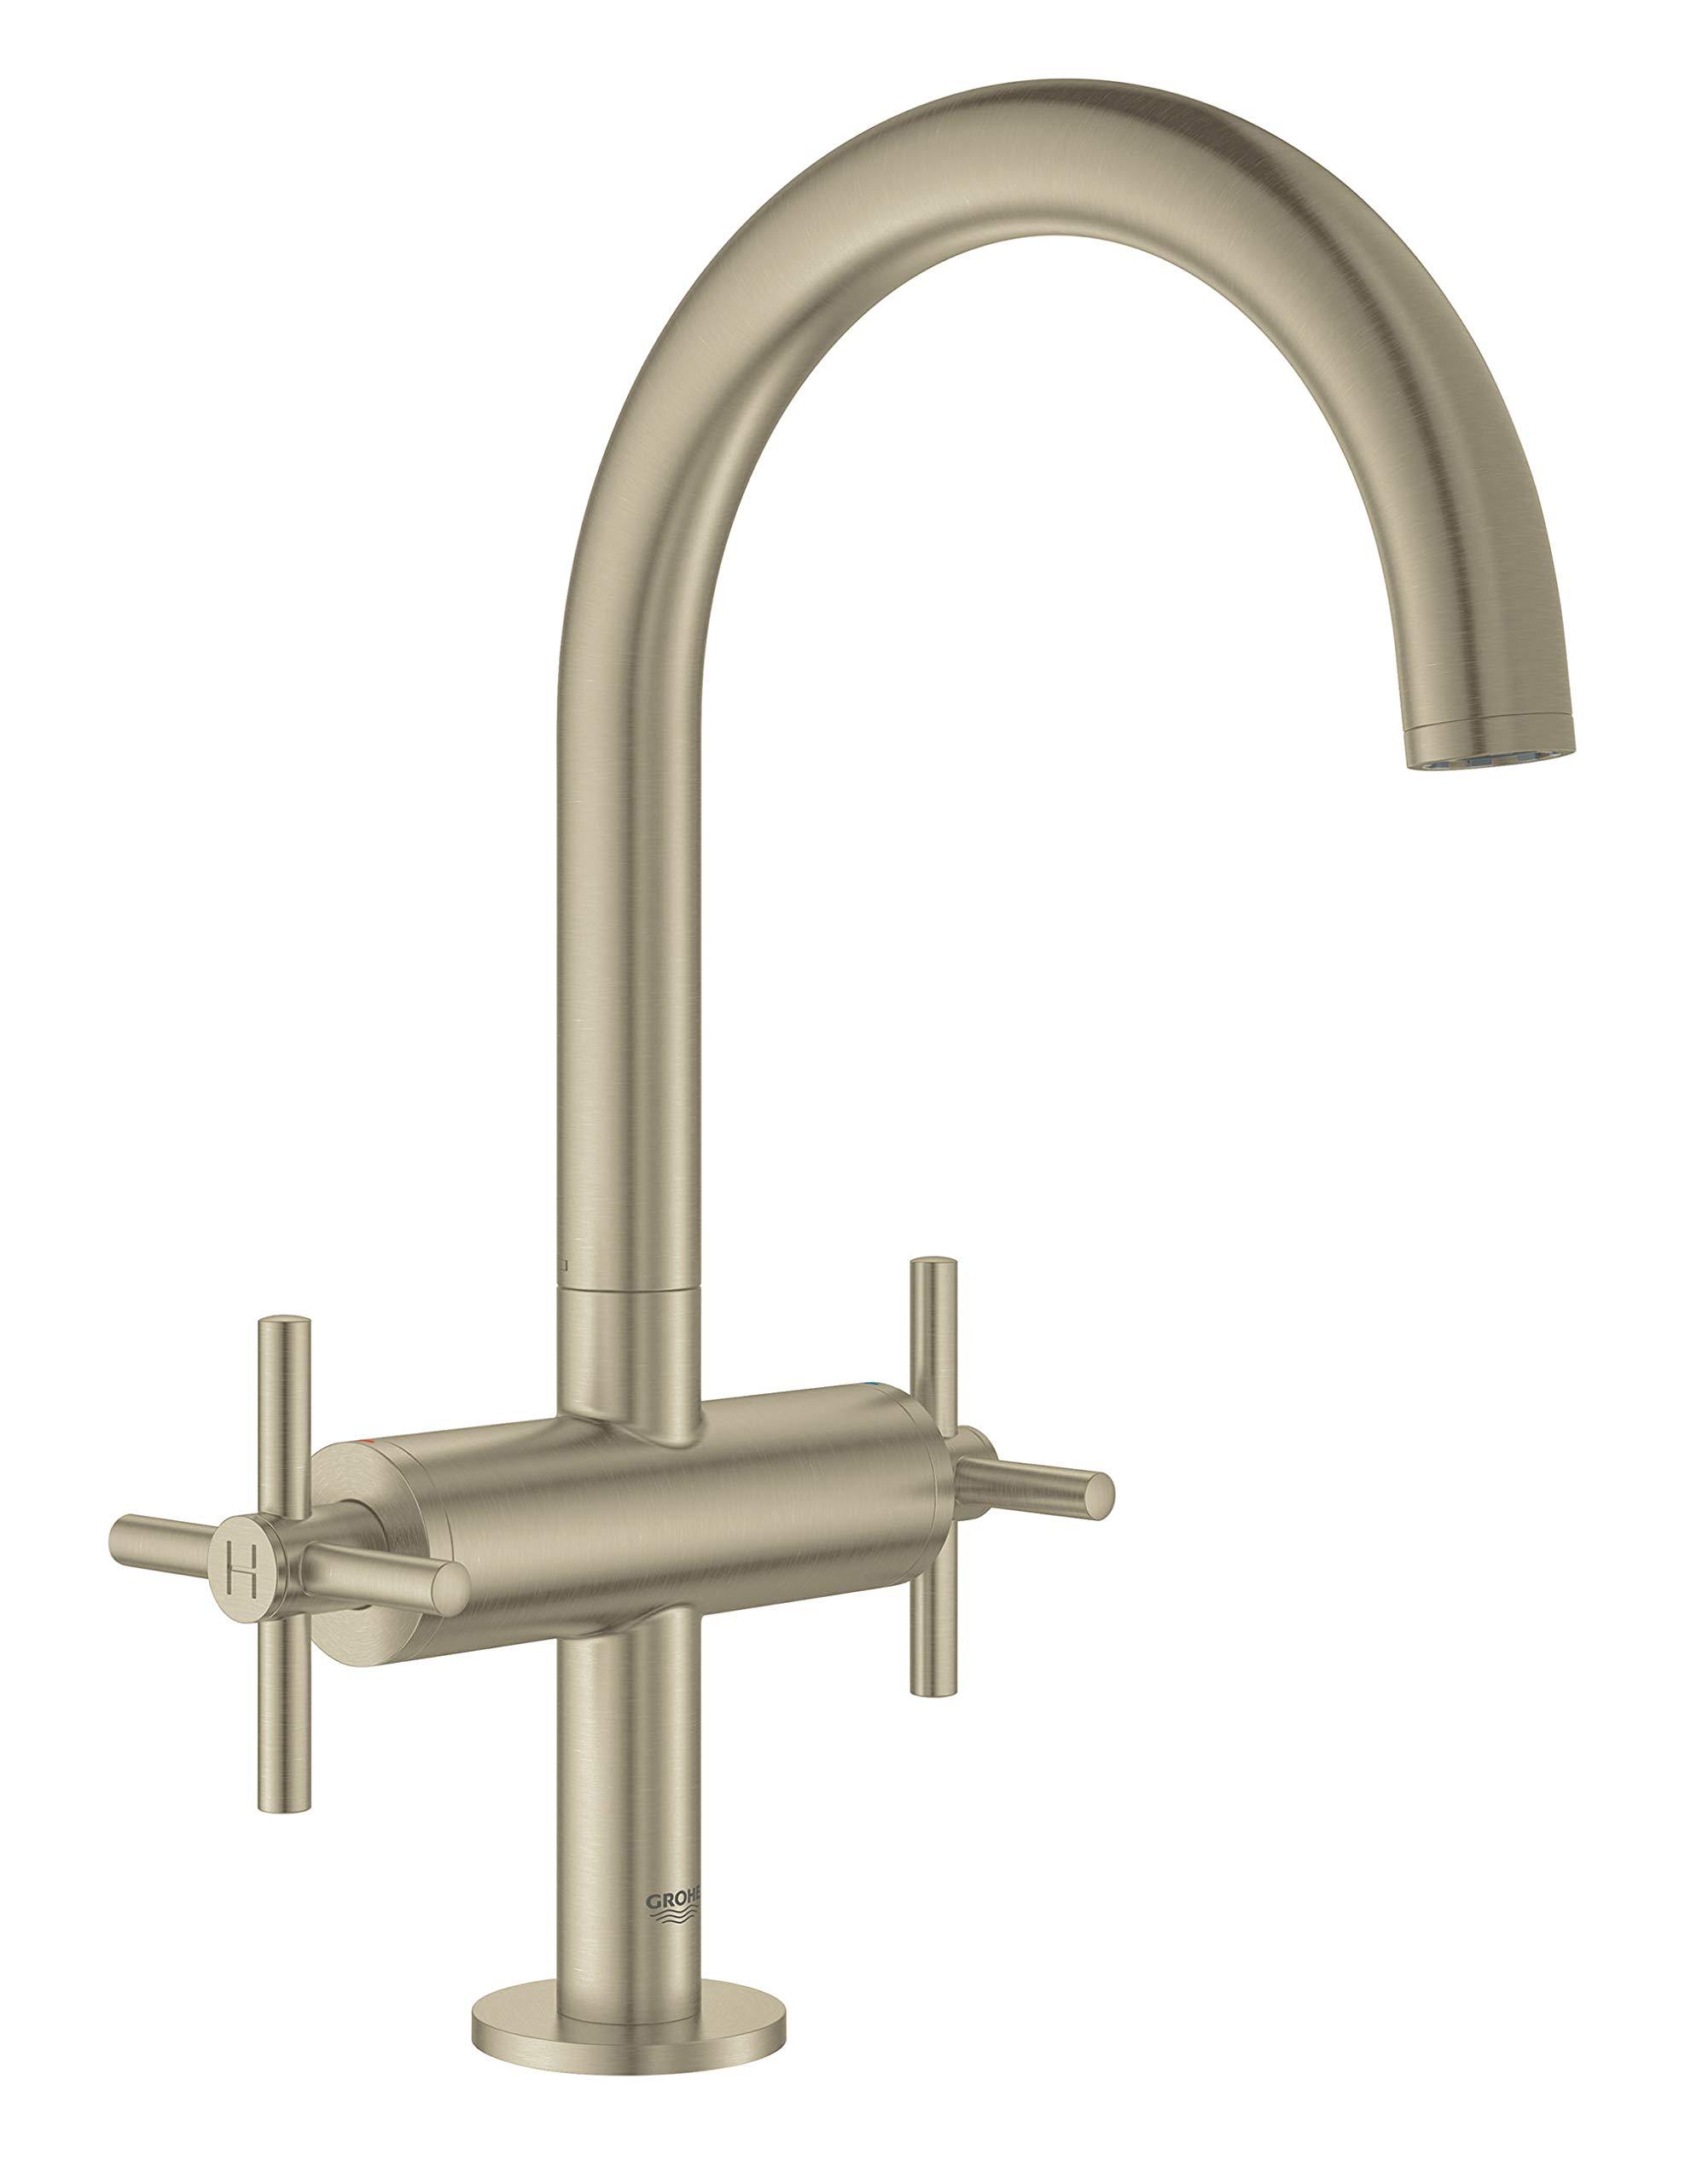 Grohe 18026EN3 Atrio Bathroom Faucet Cross Handles, Brushed Nickel by GROHE (Image #3)